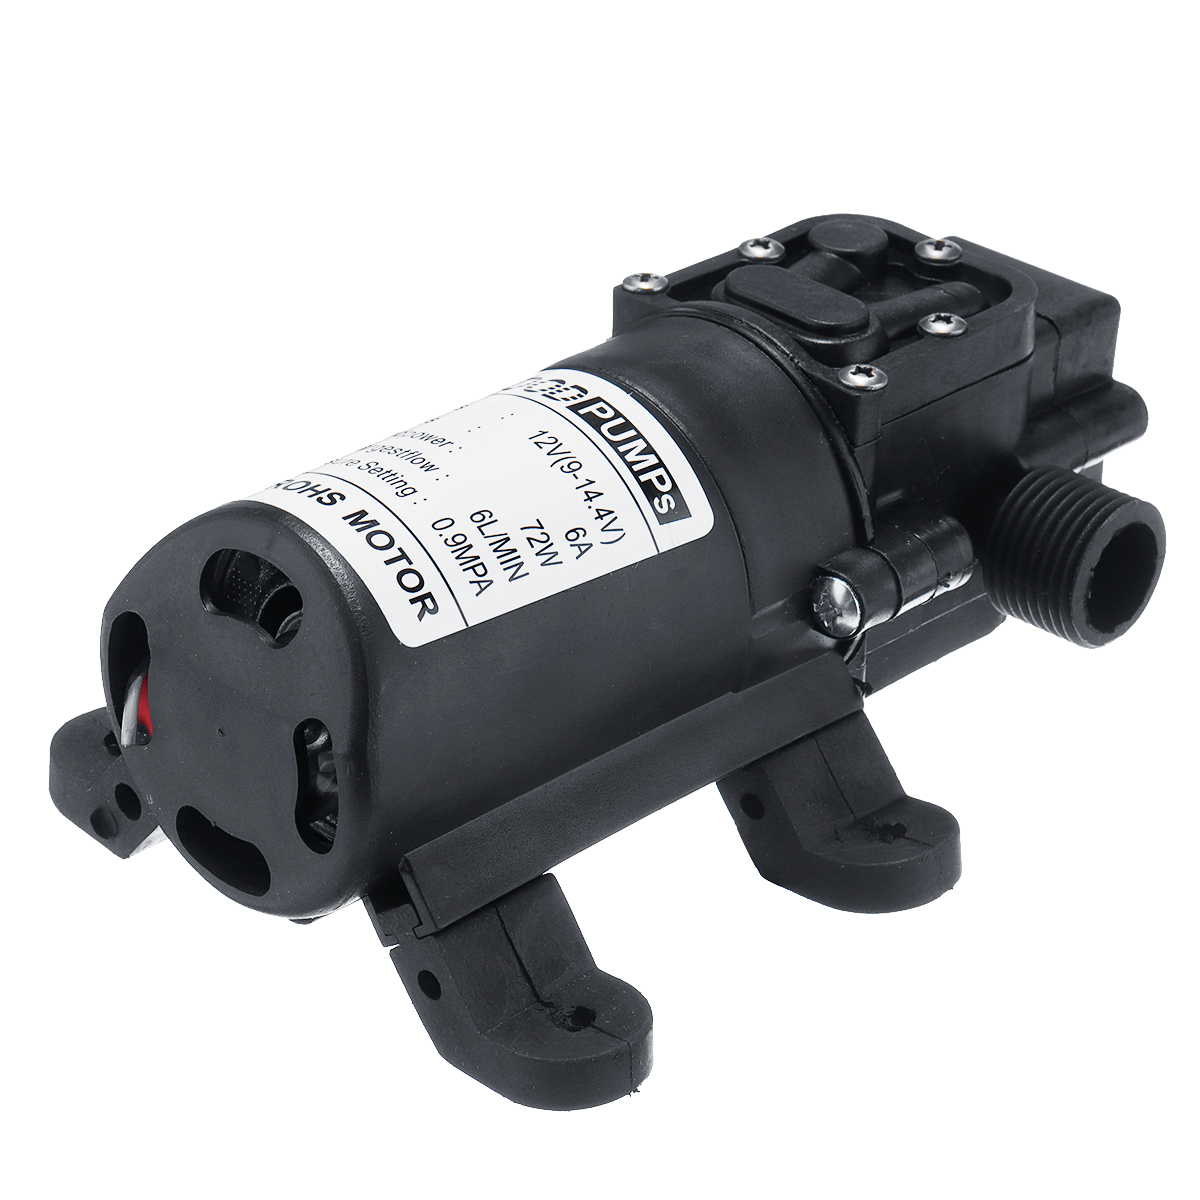 12V 72W Water Diaphragm Pump 6L 20mm Water Pump Diaphragm Self Priming Sprayer Pump